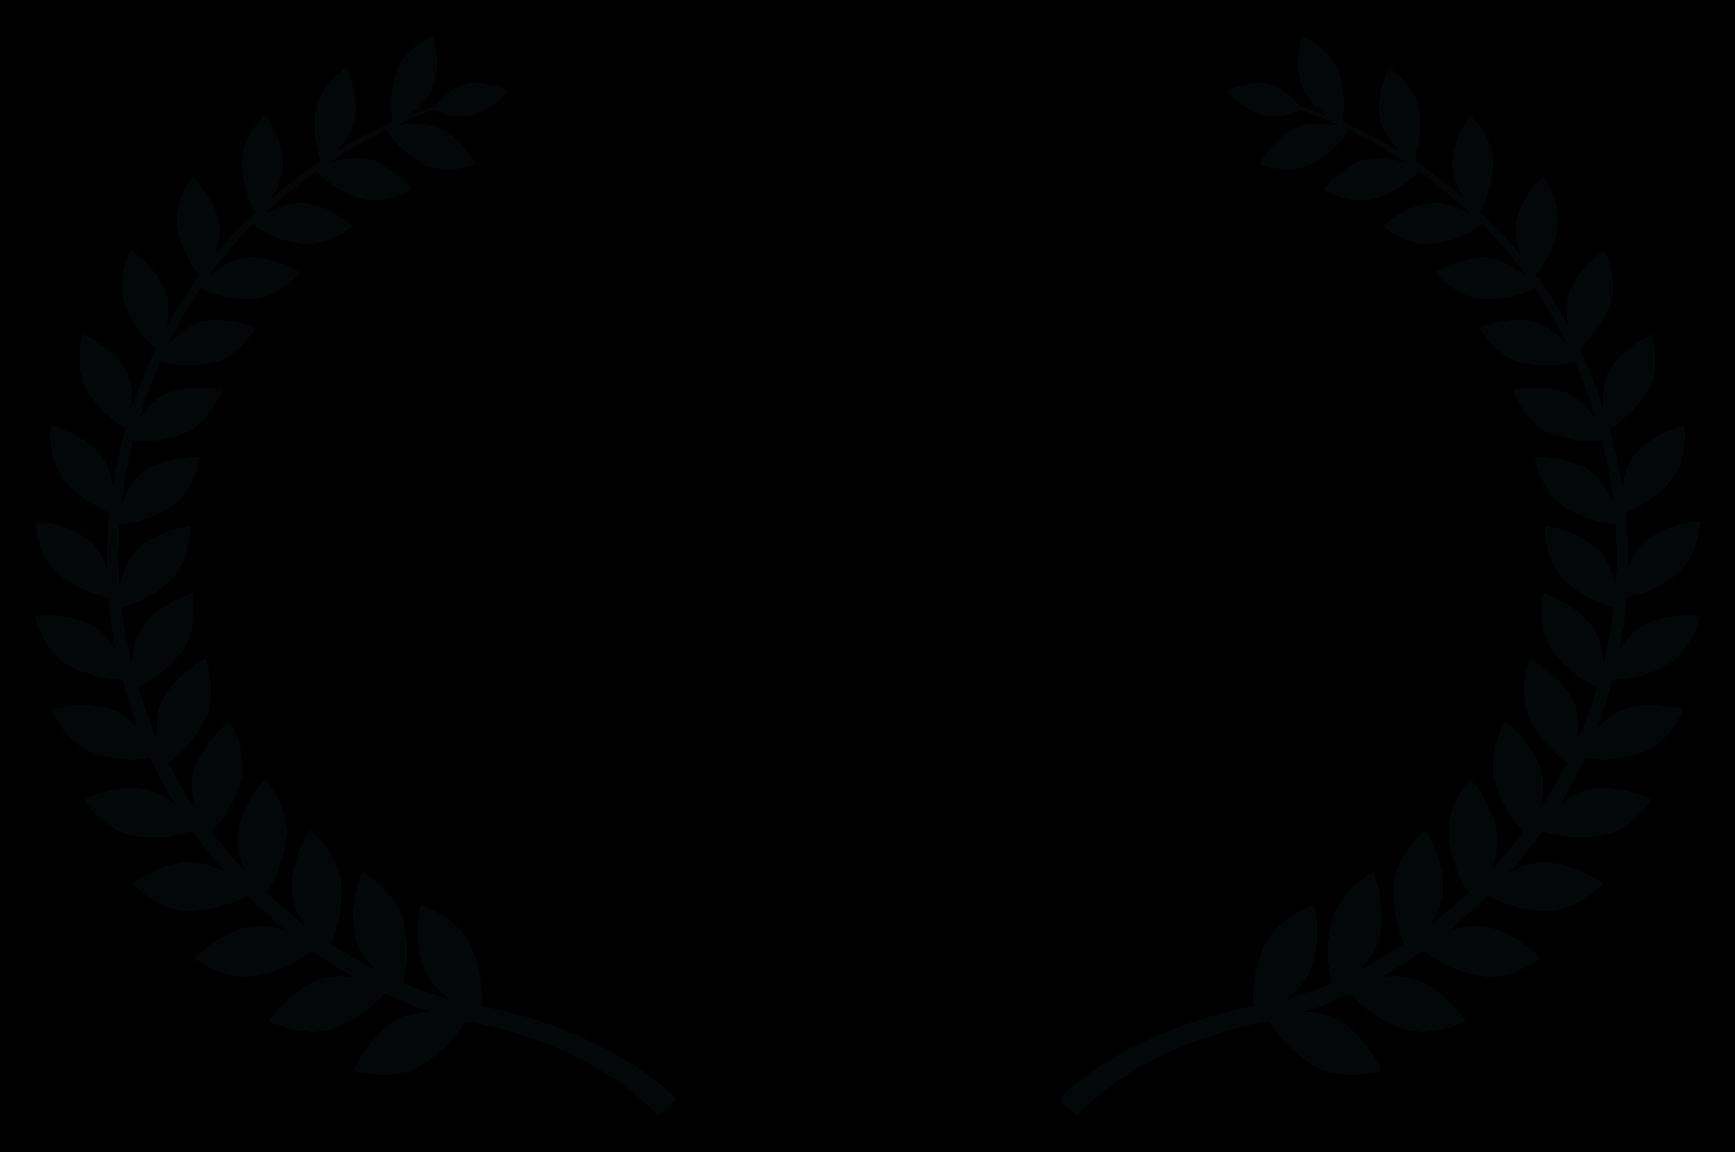 OFFICIAL SELECTION - Festival de Cinema